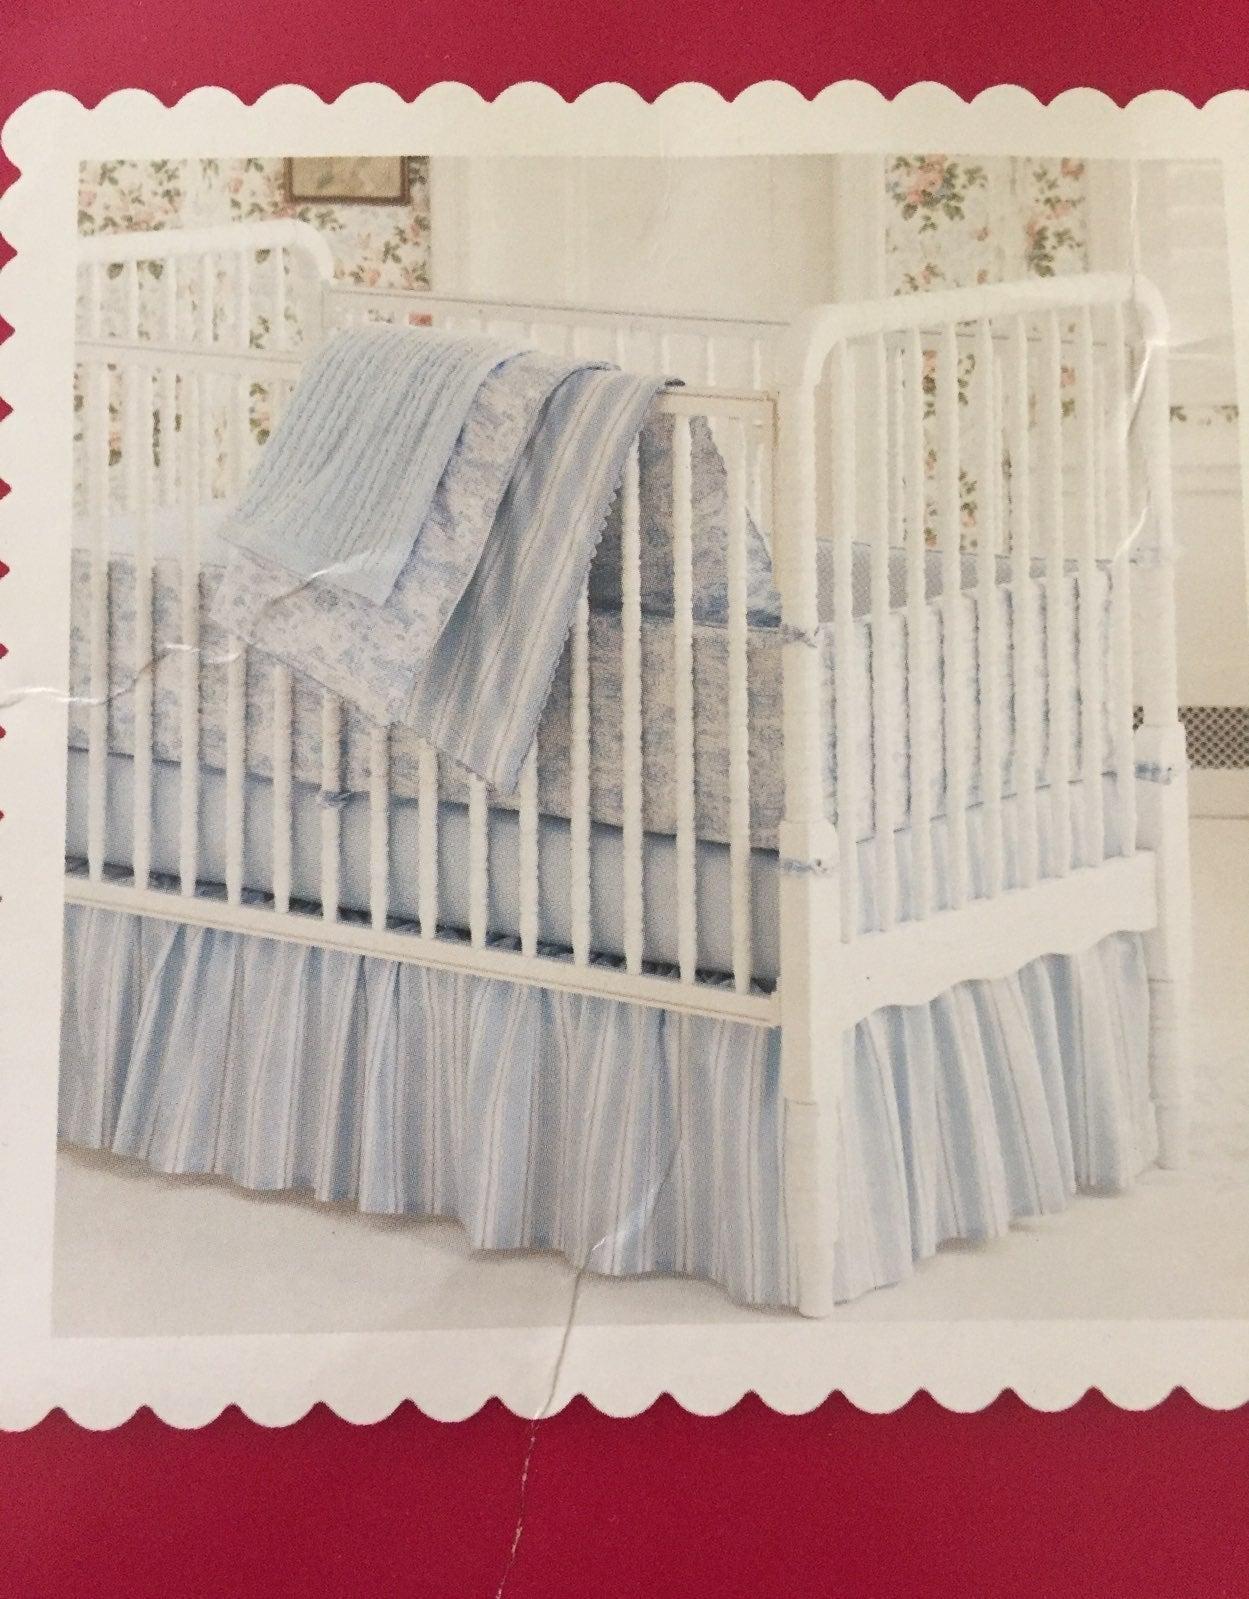 Hush-A-Bye Crib Dust Ruffle